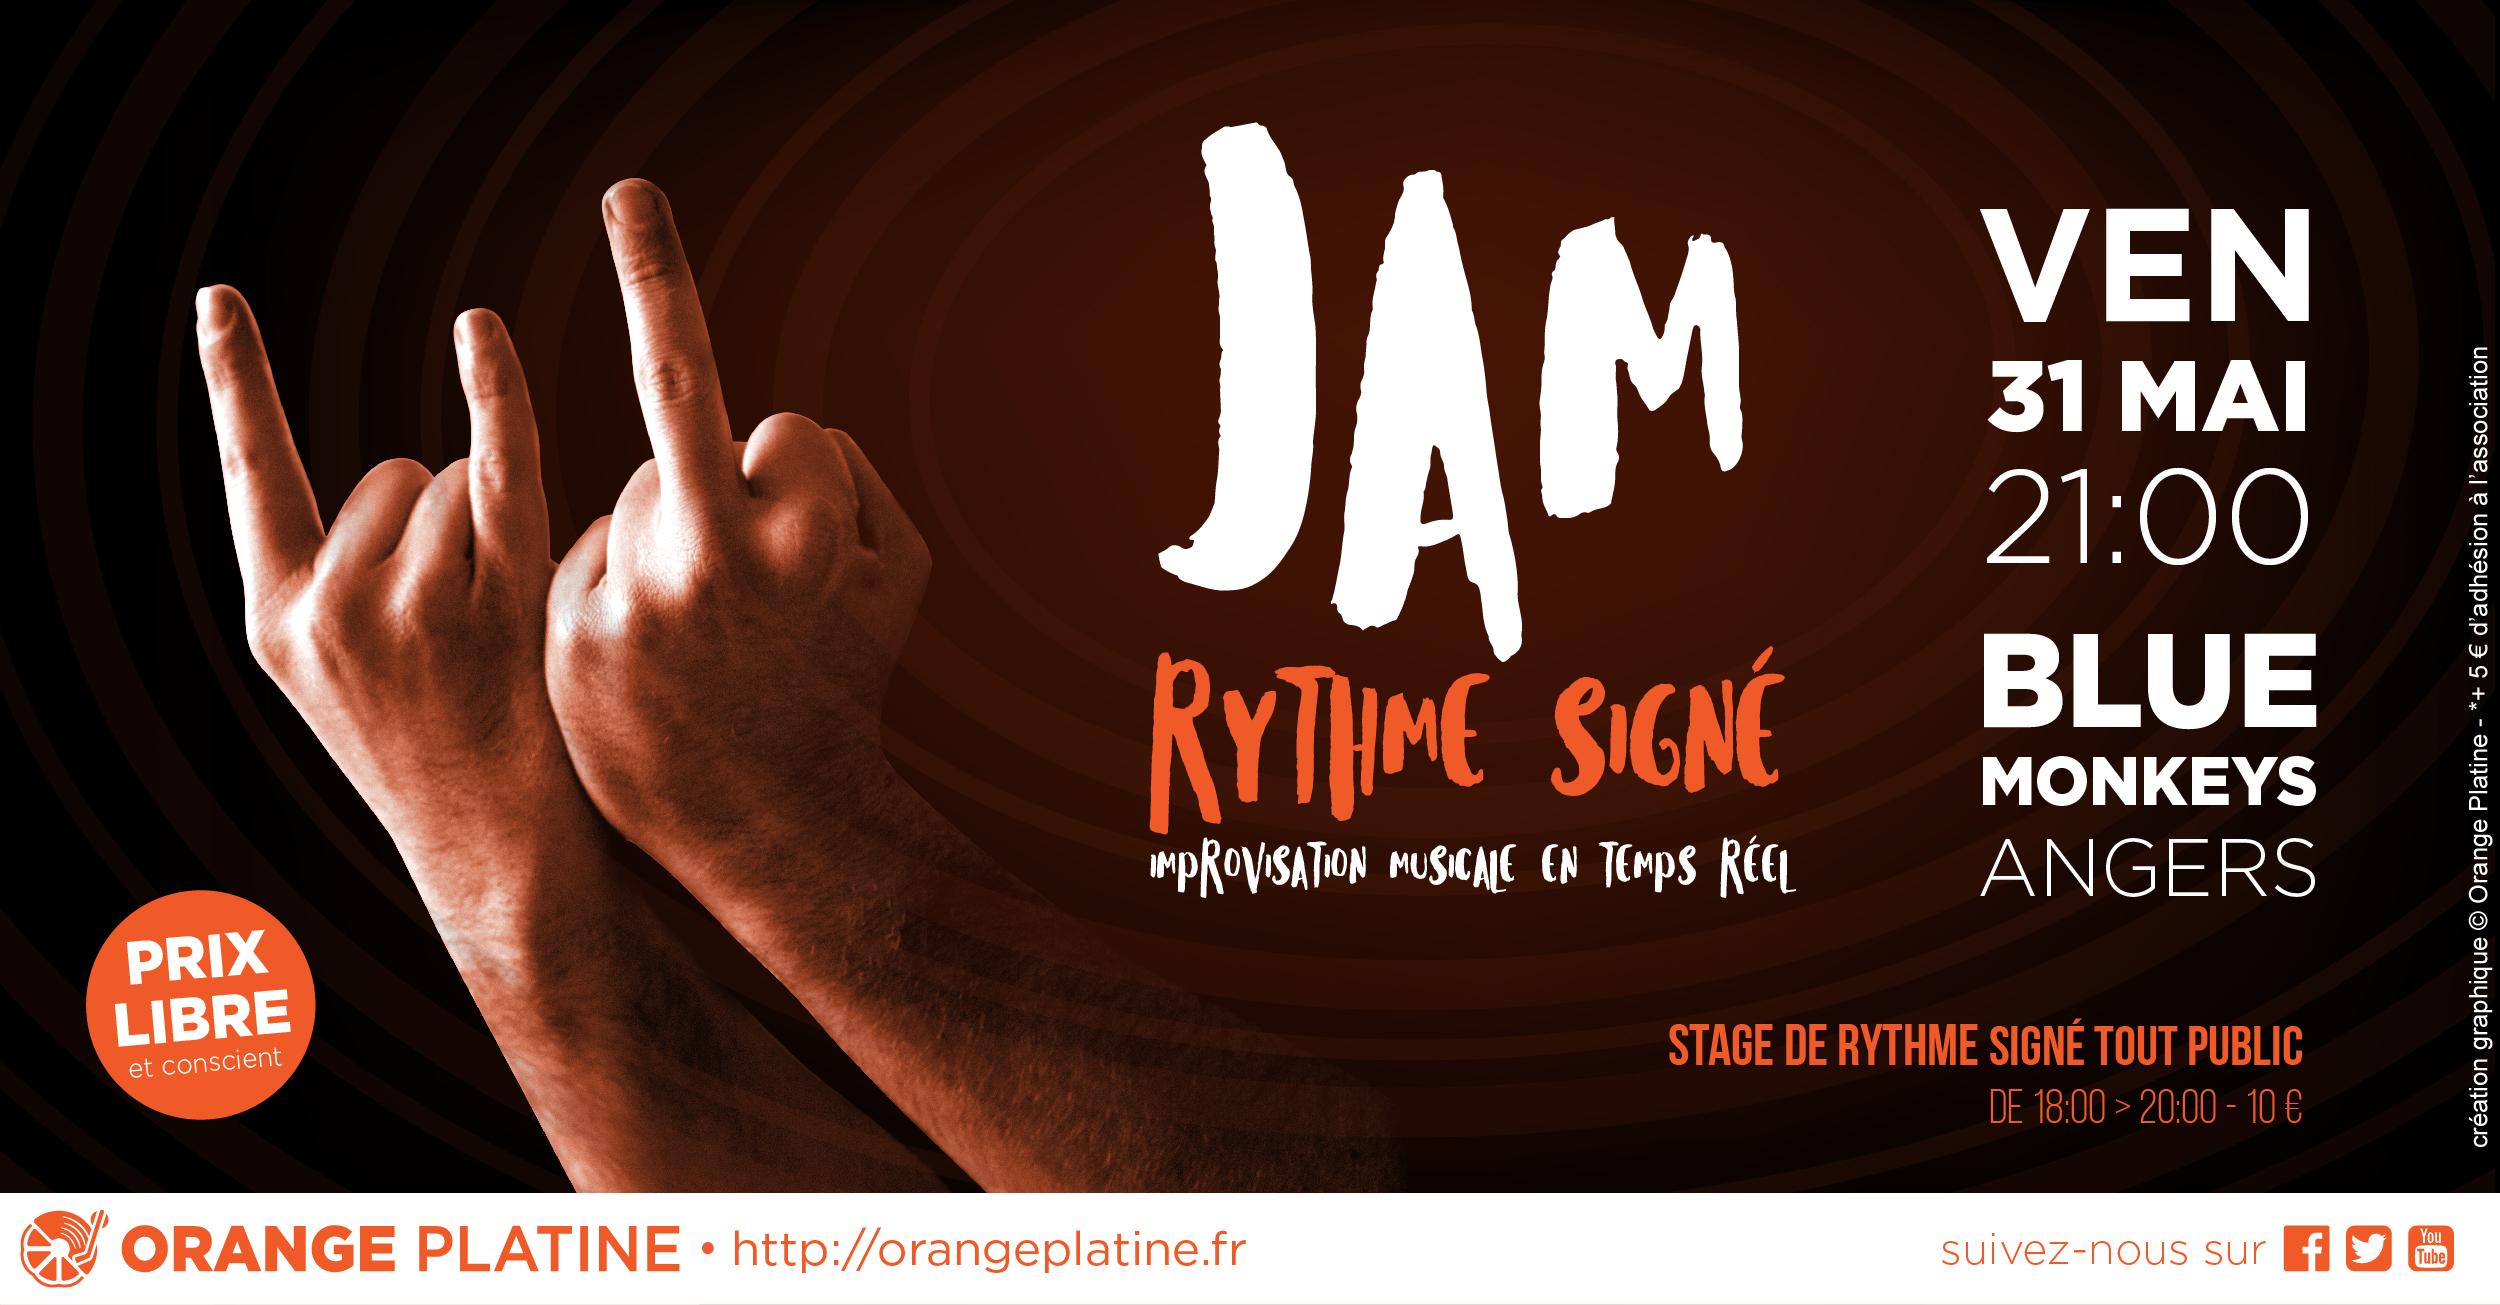 Jam Rythme Signé - Blue Monkeys 190531